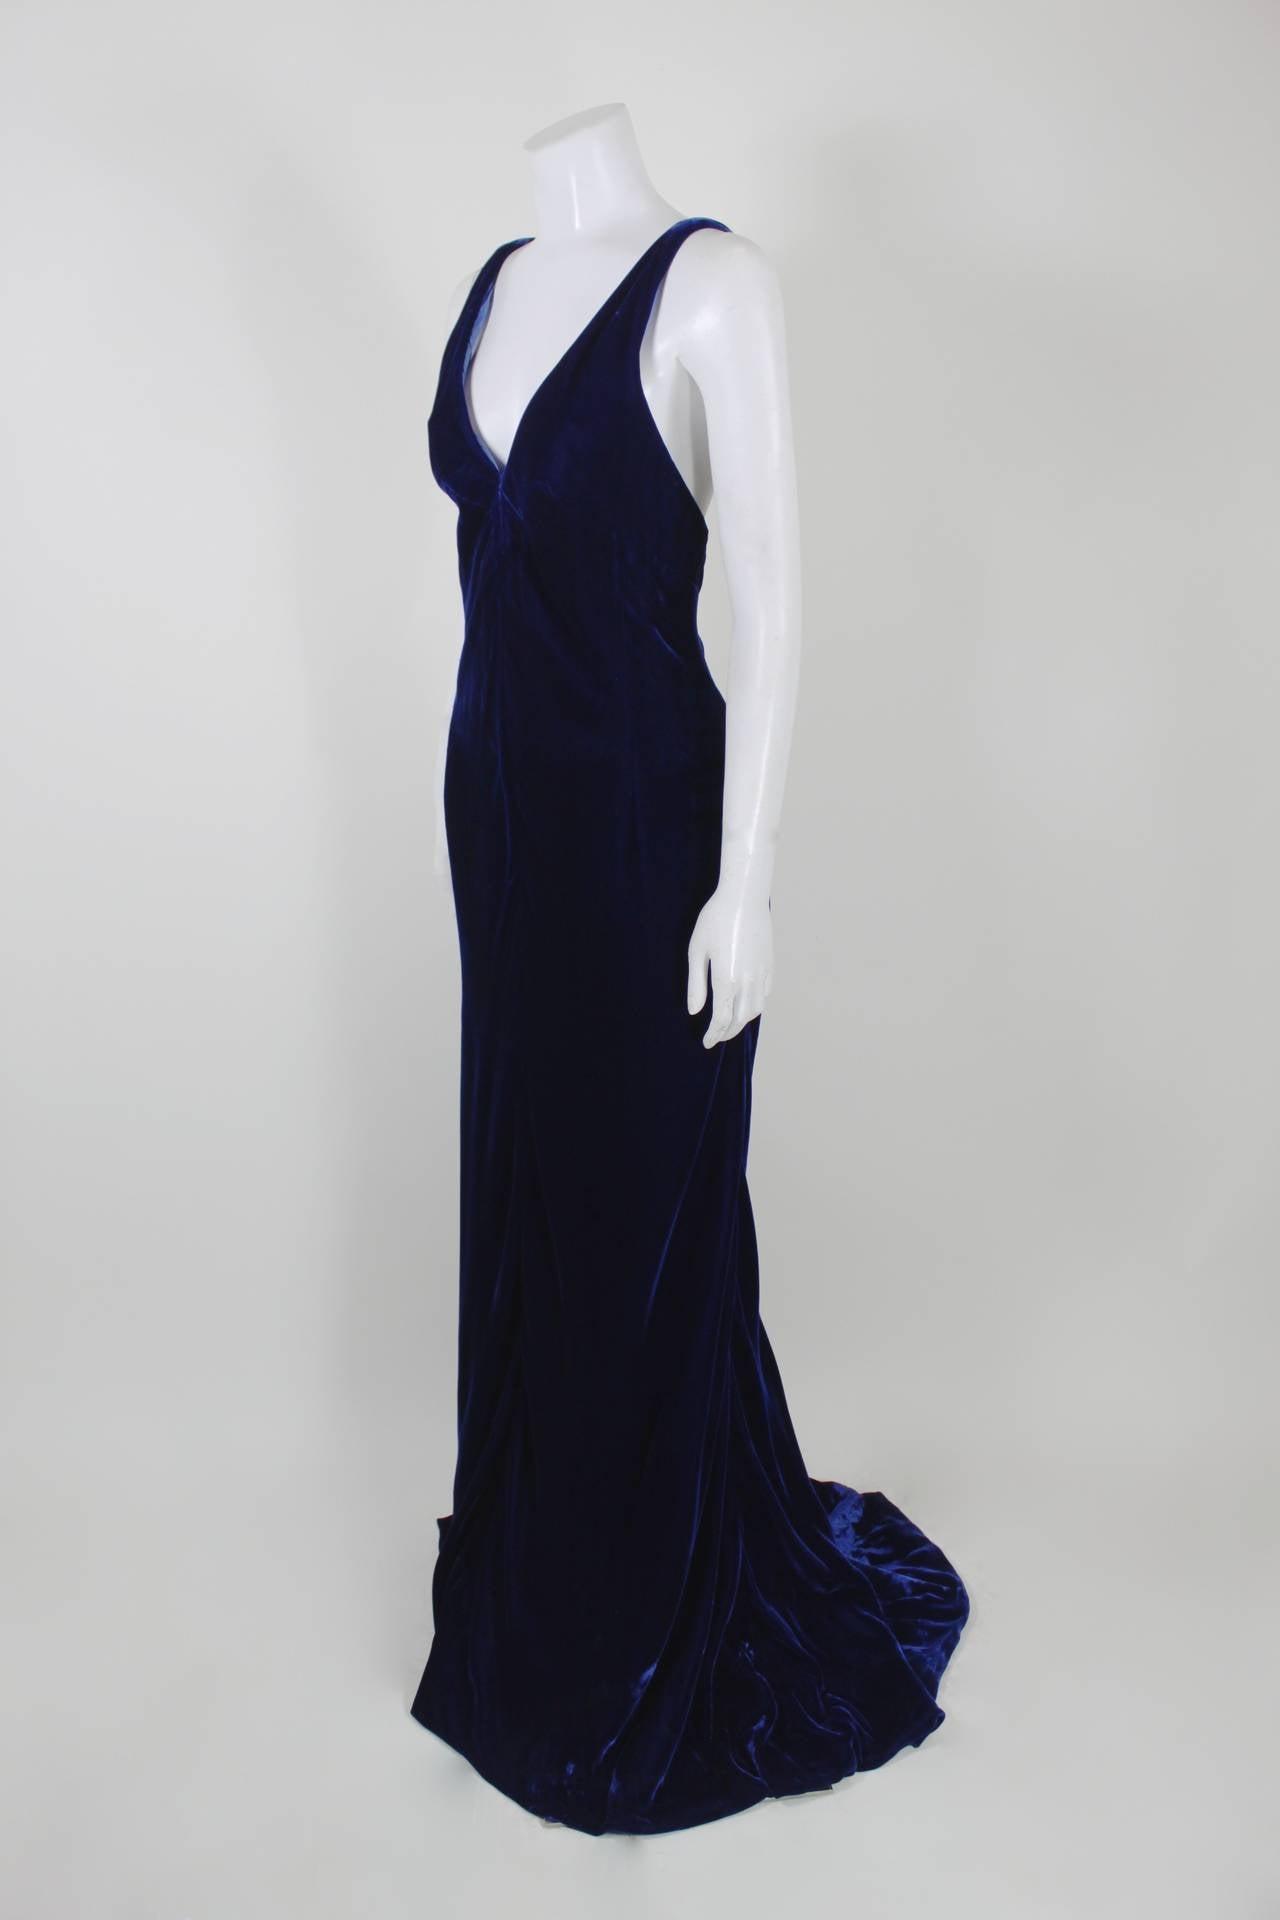 Women's Jacqueline De Ribes Stunning Midnight Blue Velvet Evening Gown For Sale